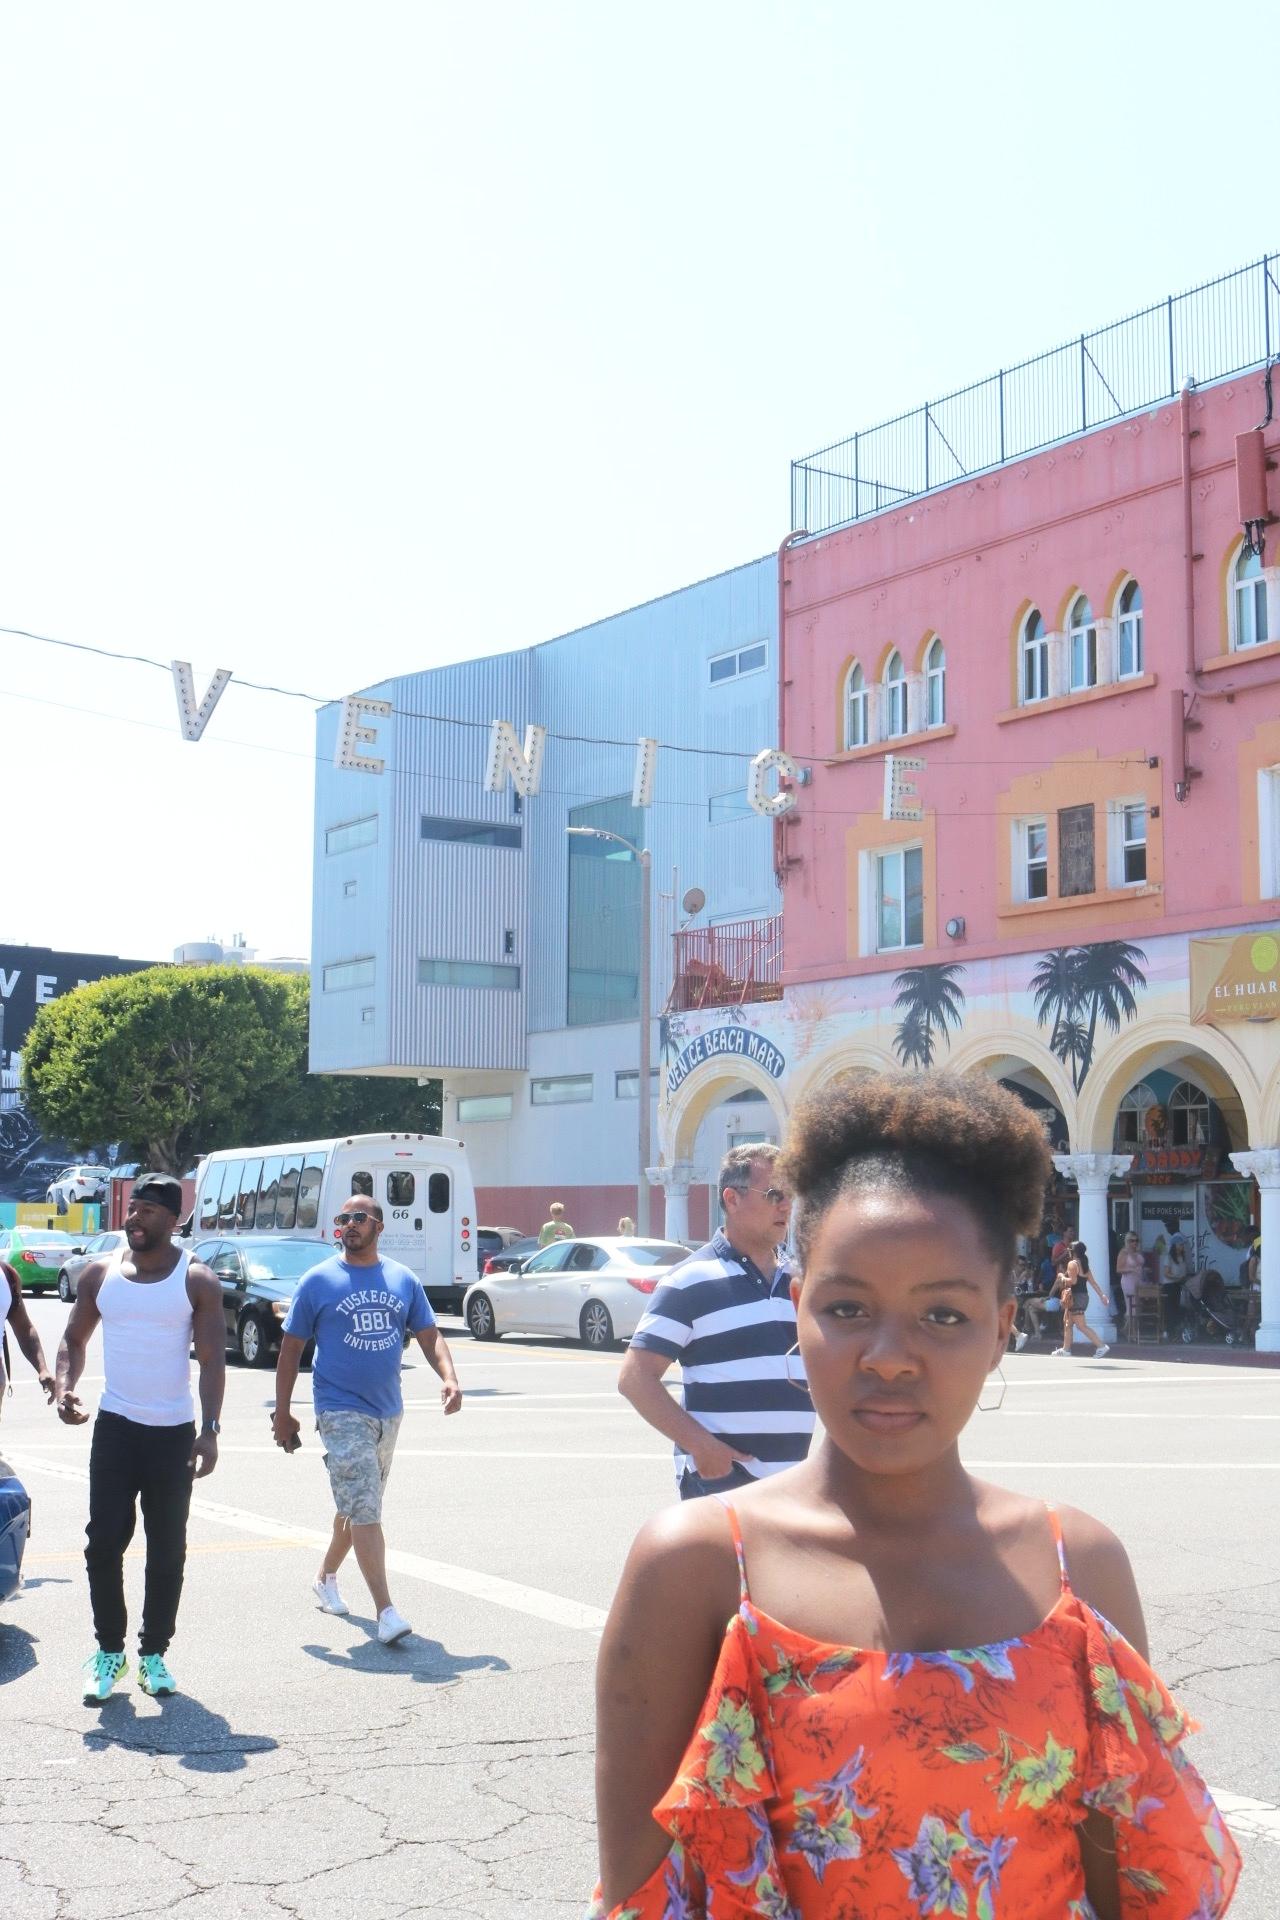 Nonee in Venice Beach